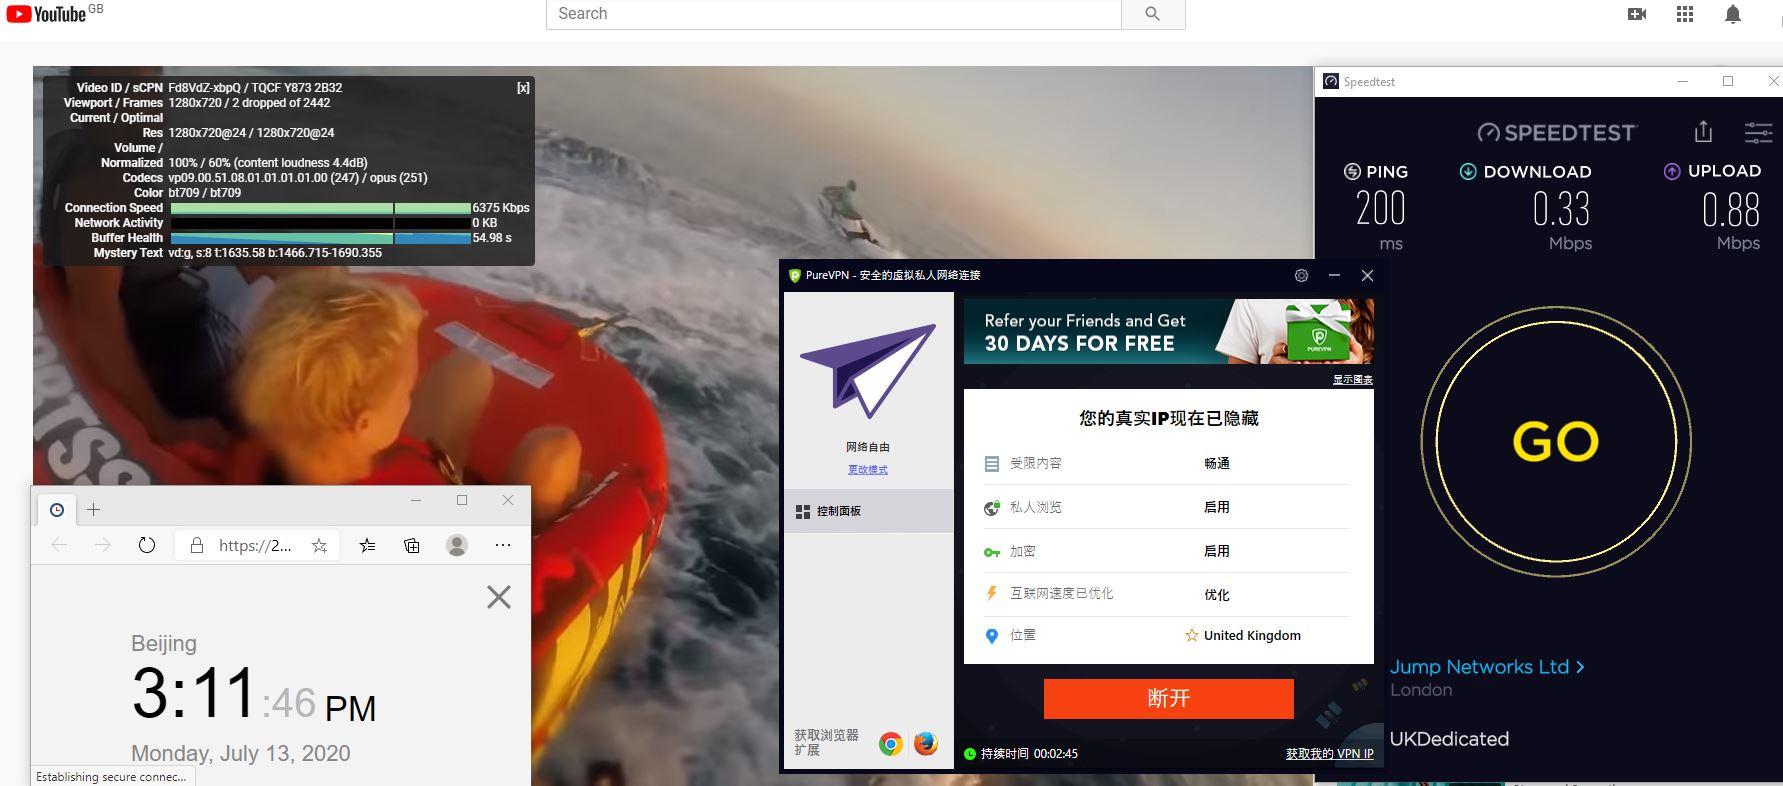 Windows10 PureVPN UK 中国VPN 翻墙 科学上网 测速-20200713